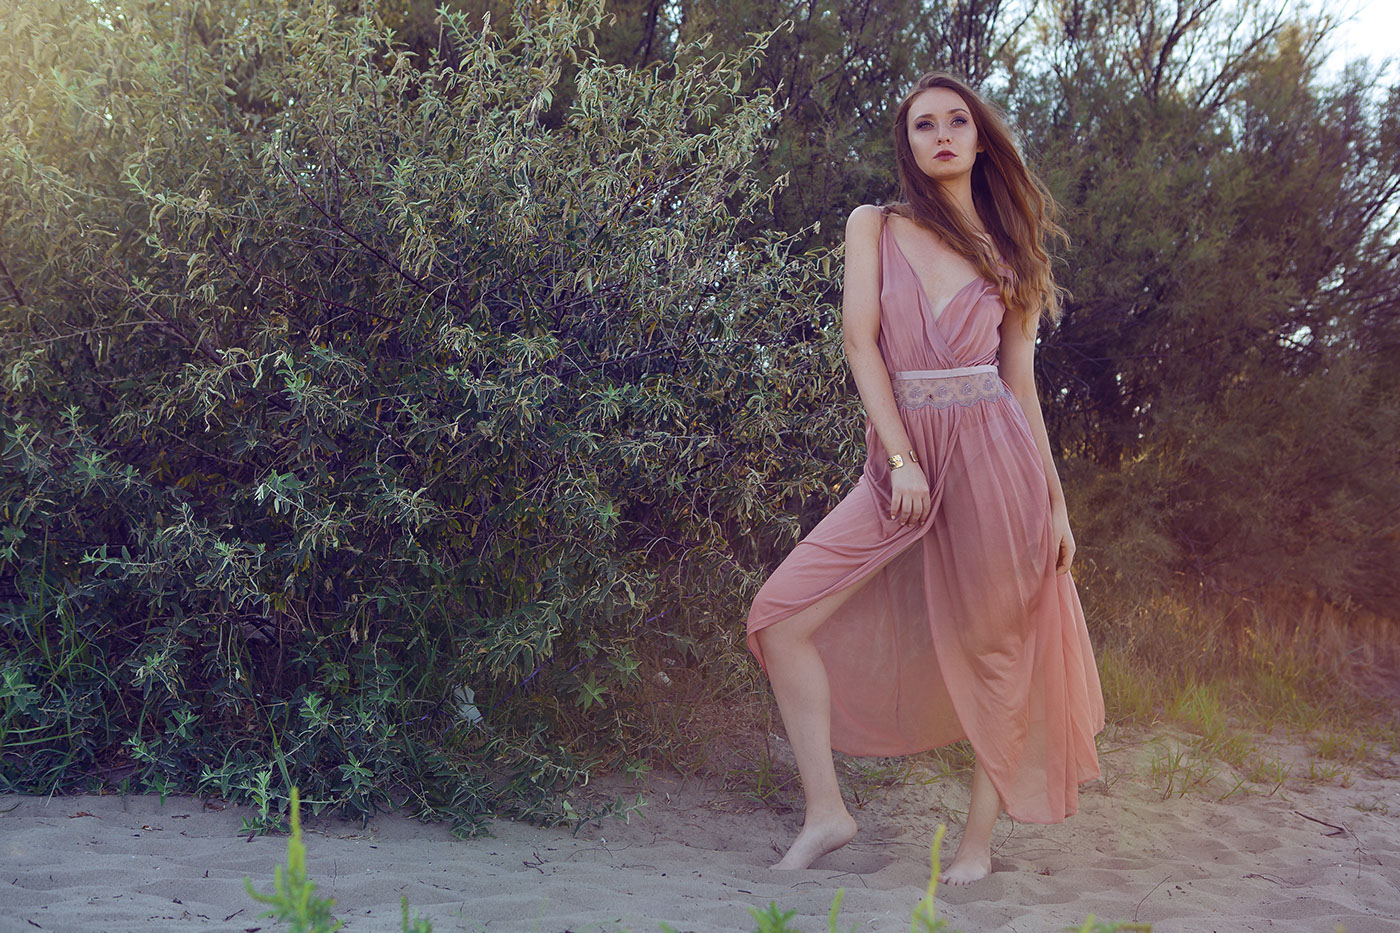 Fashion  Fashionshooting beauty portrait beach Photography